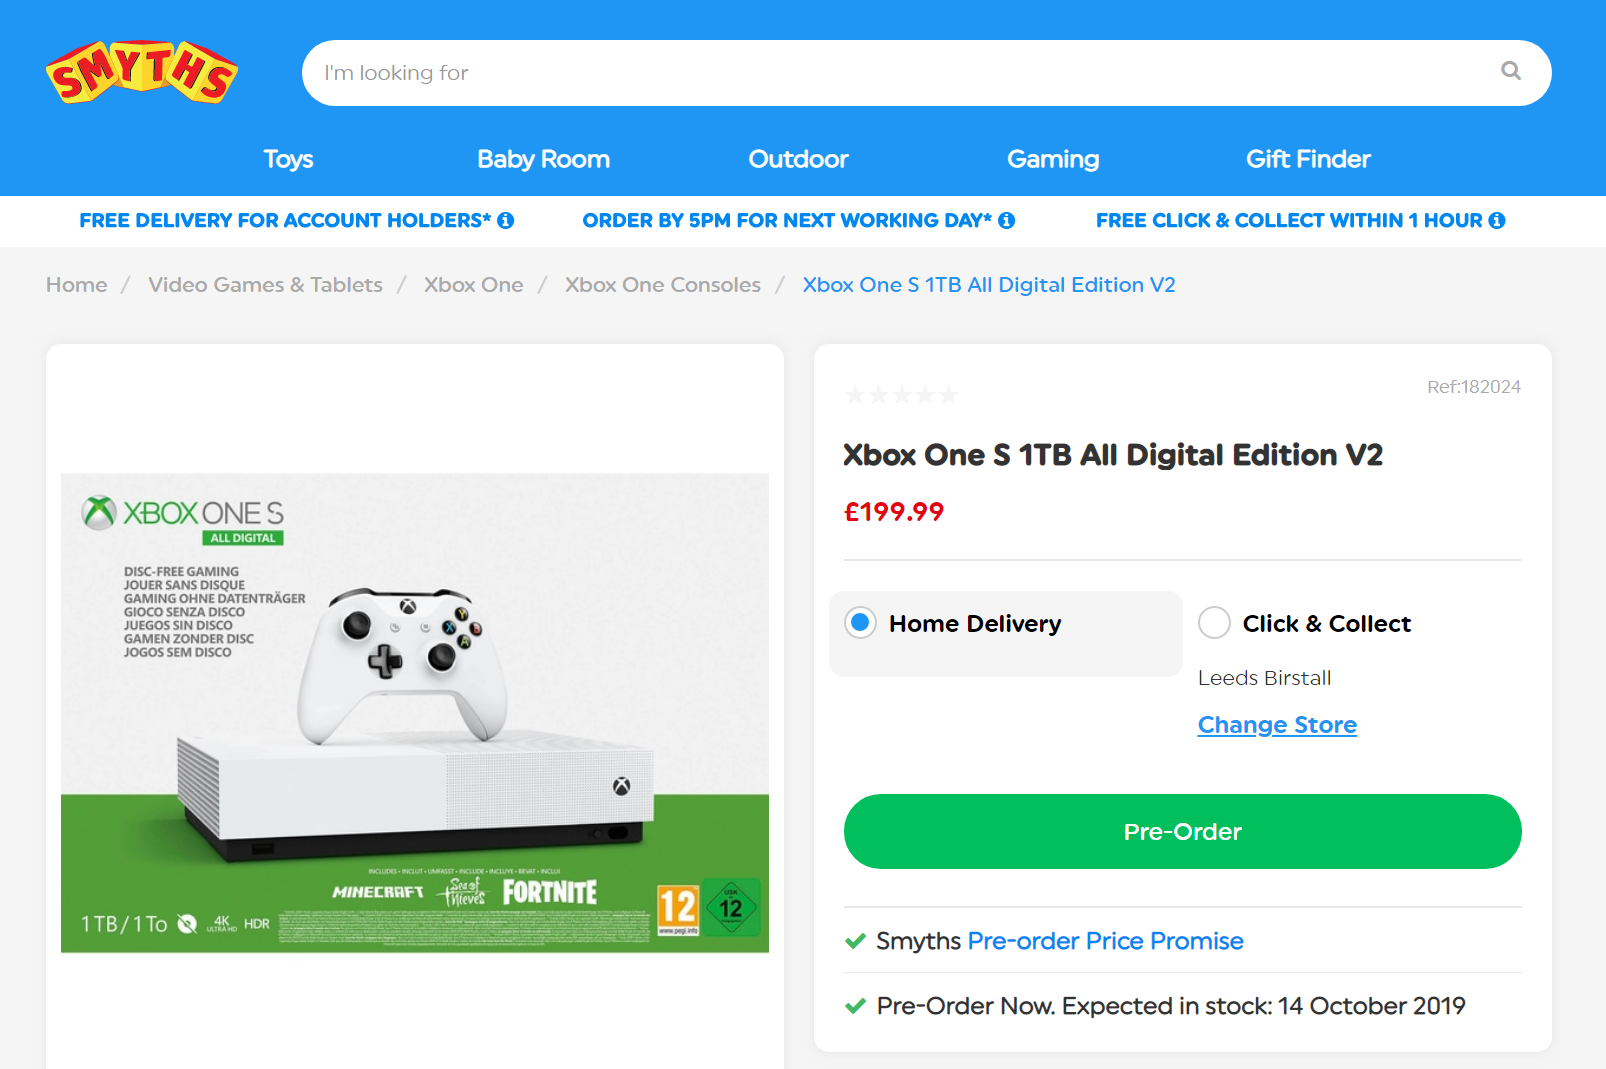 Smyths listing the Xbox One S All-Digital V2